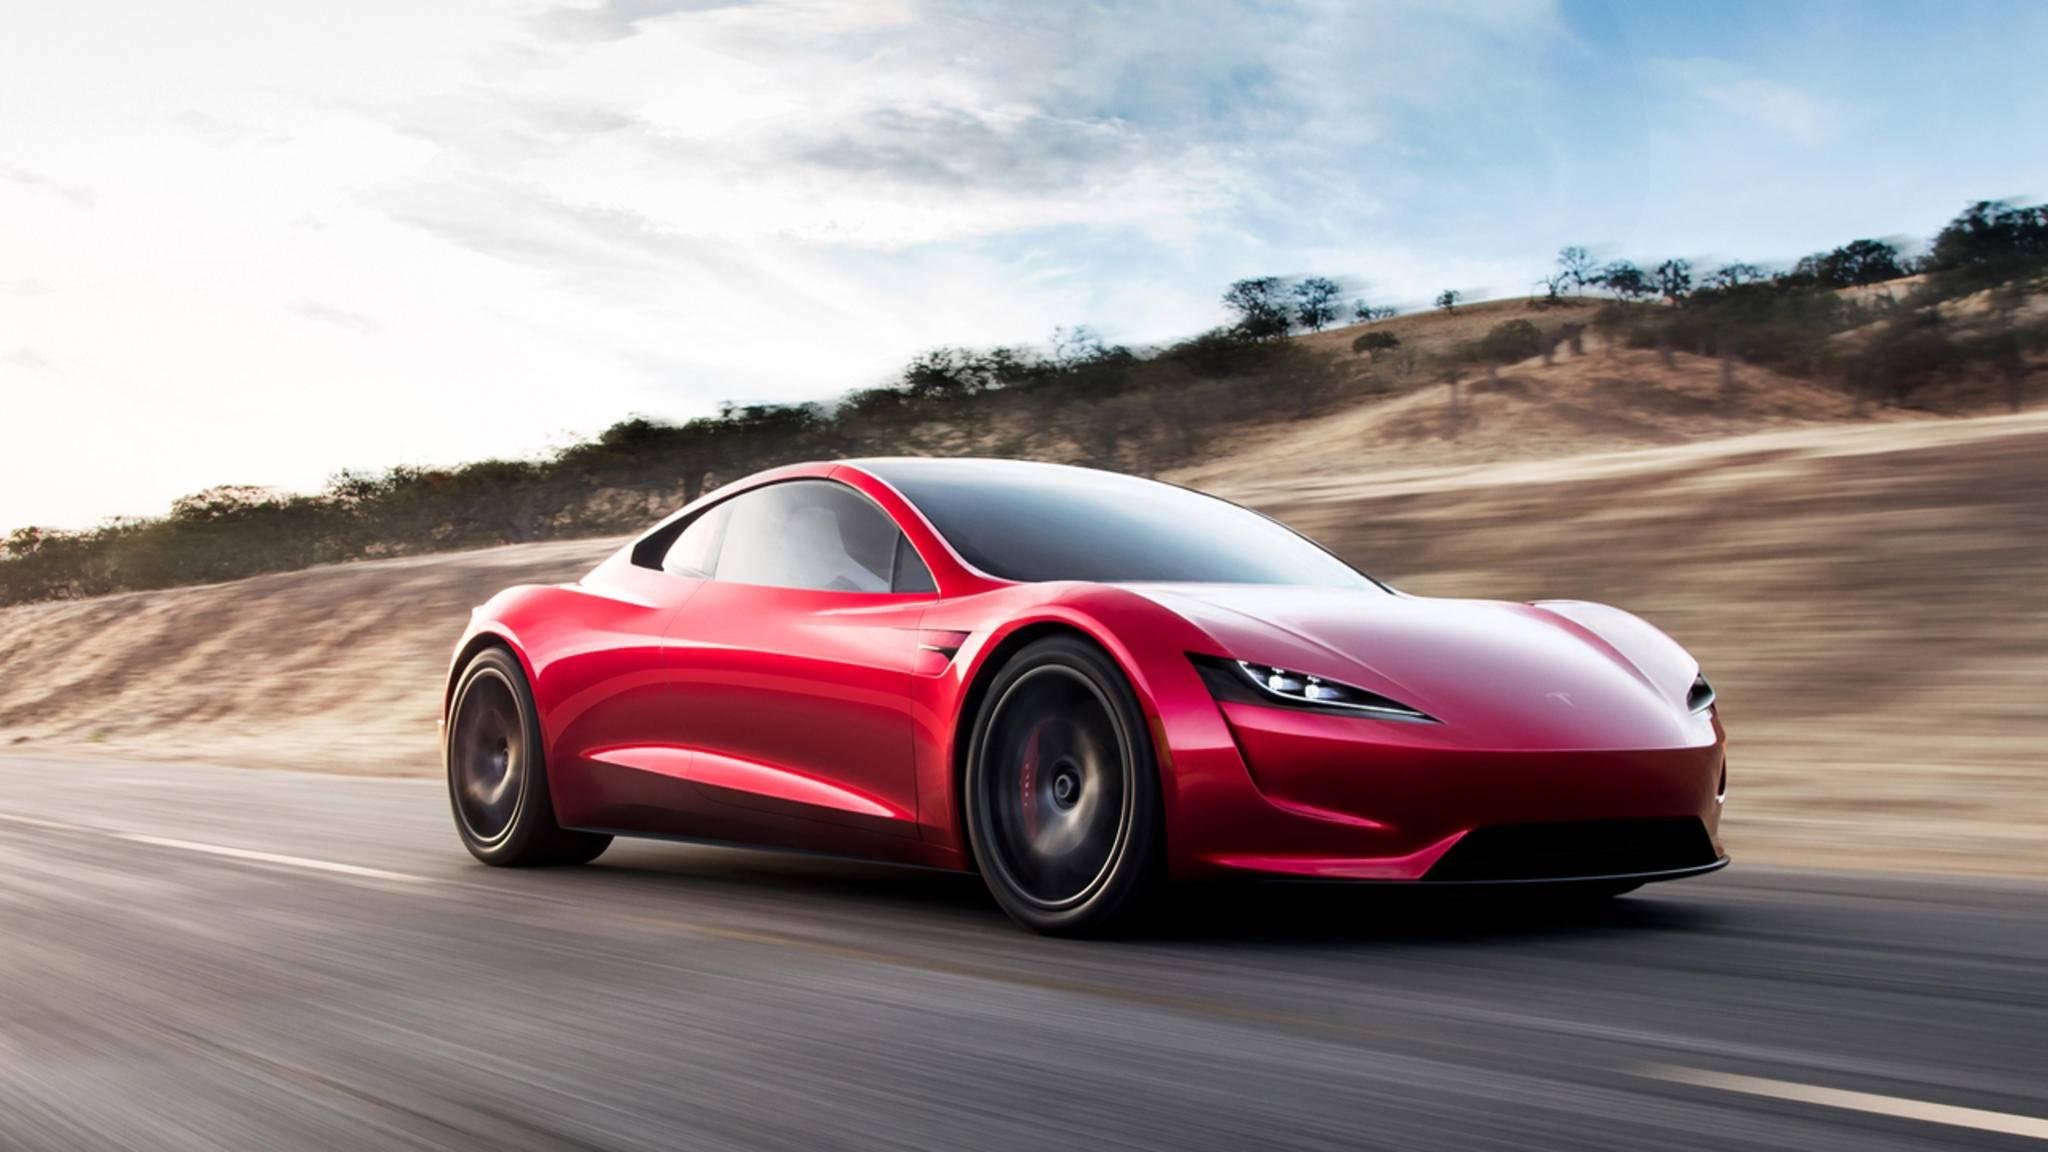 Der Tesla Roadster wird bald zum mobilen Heimkino.